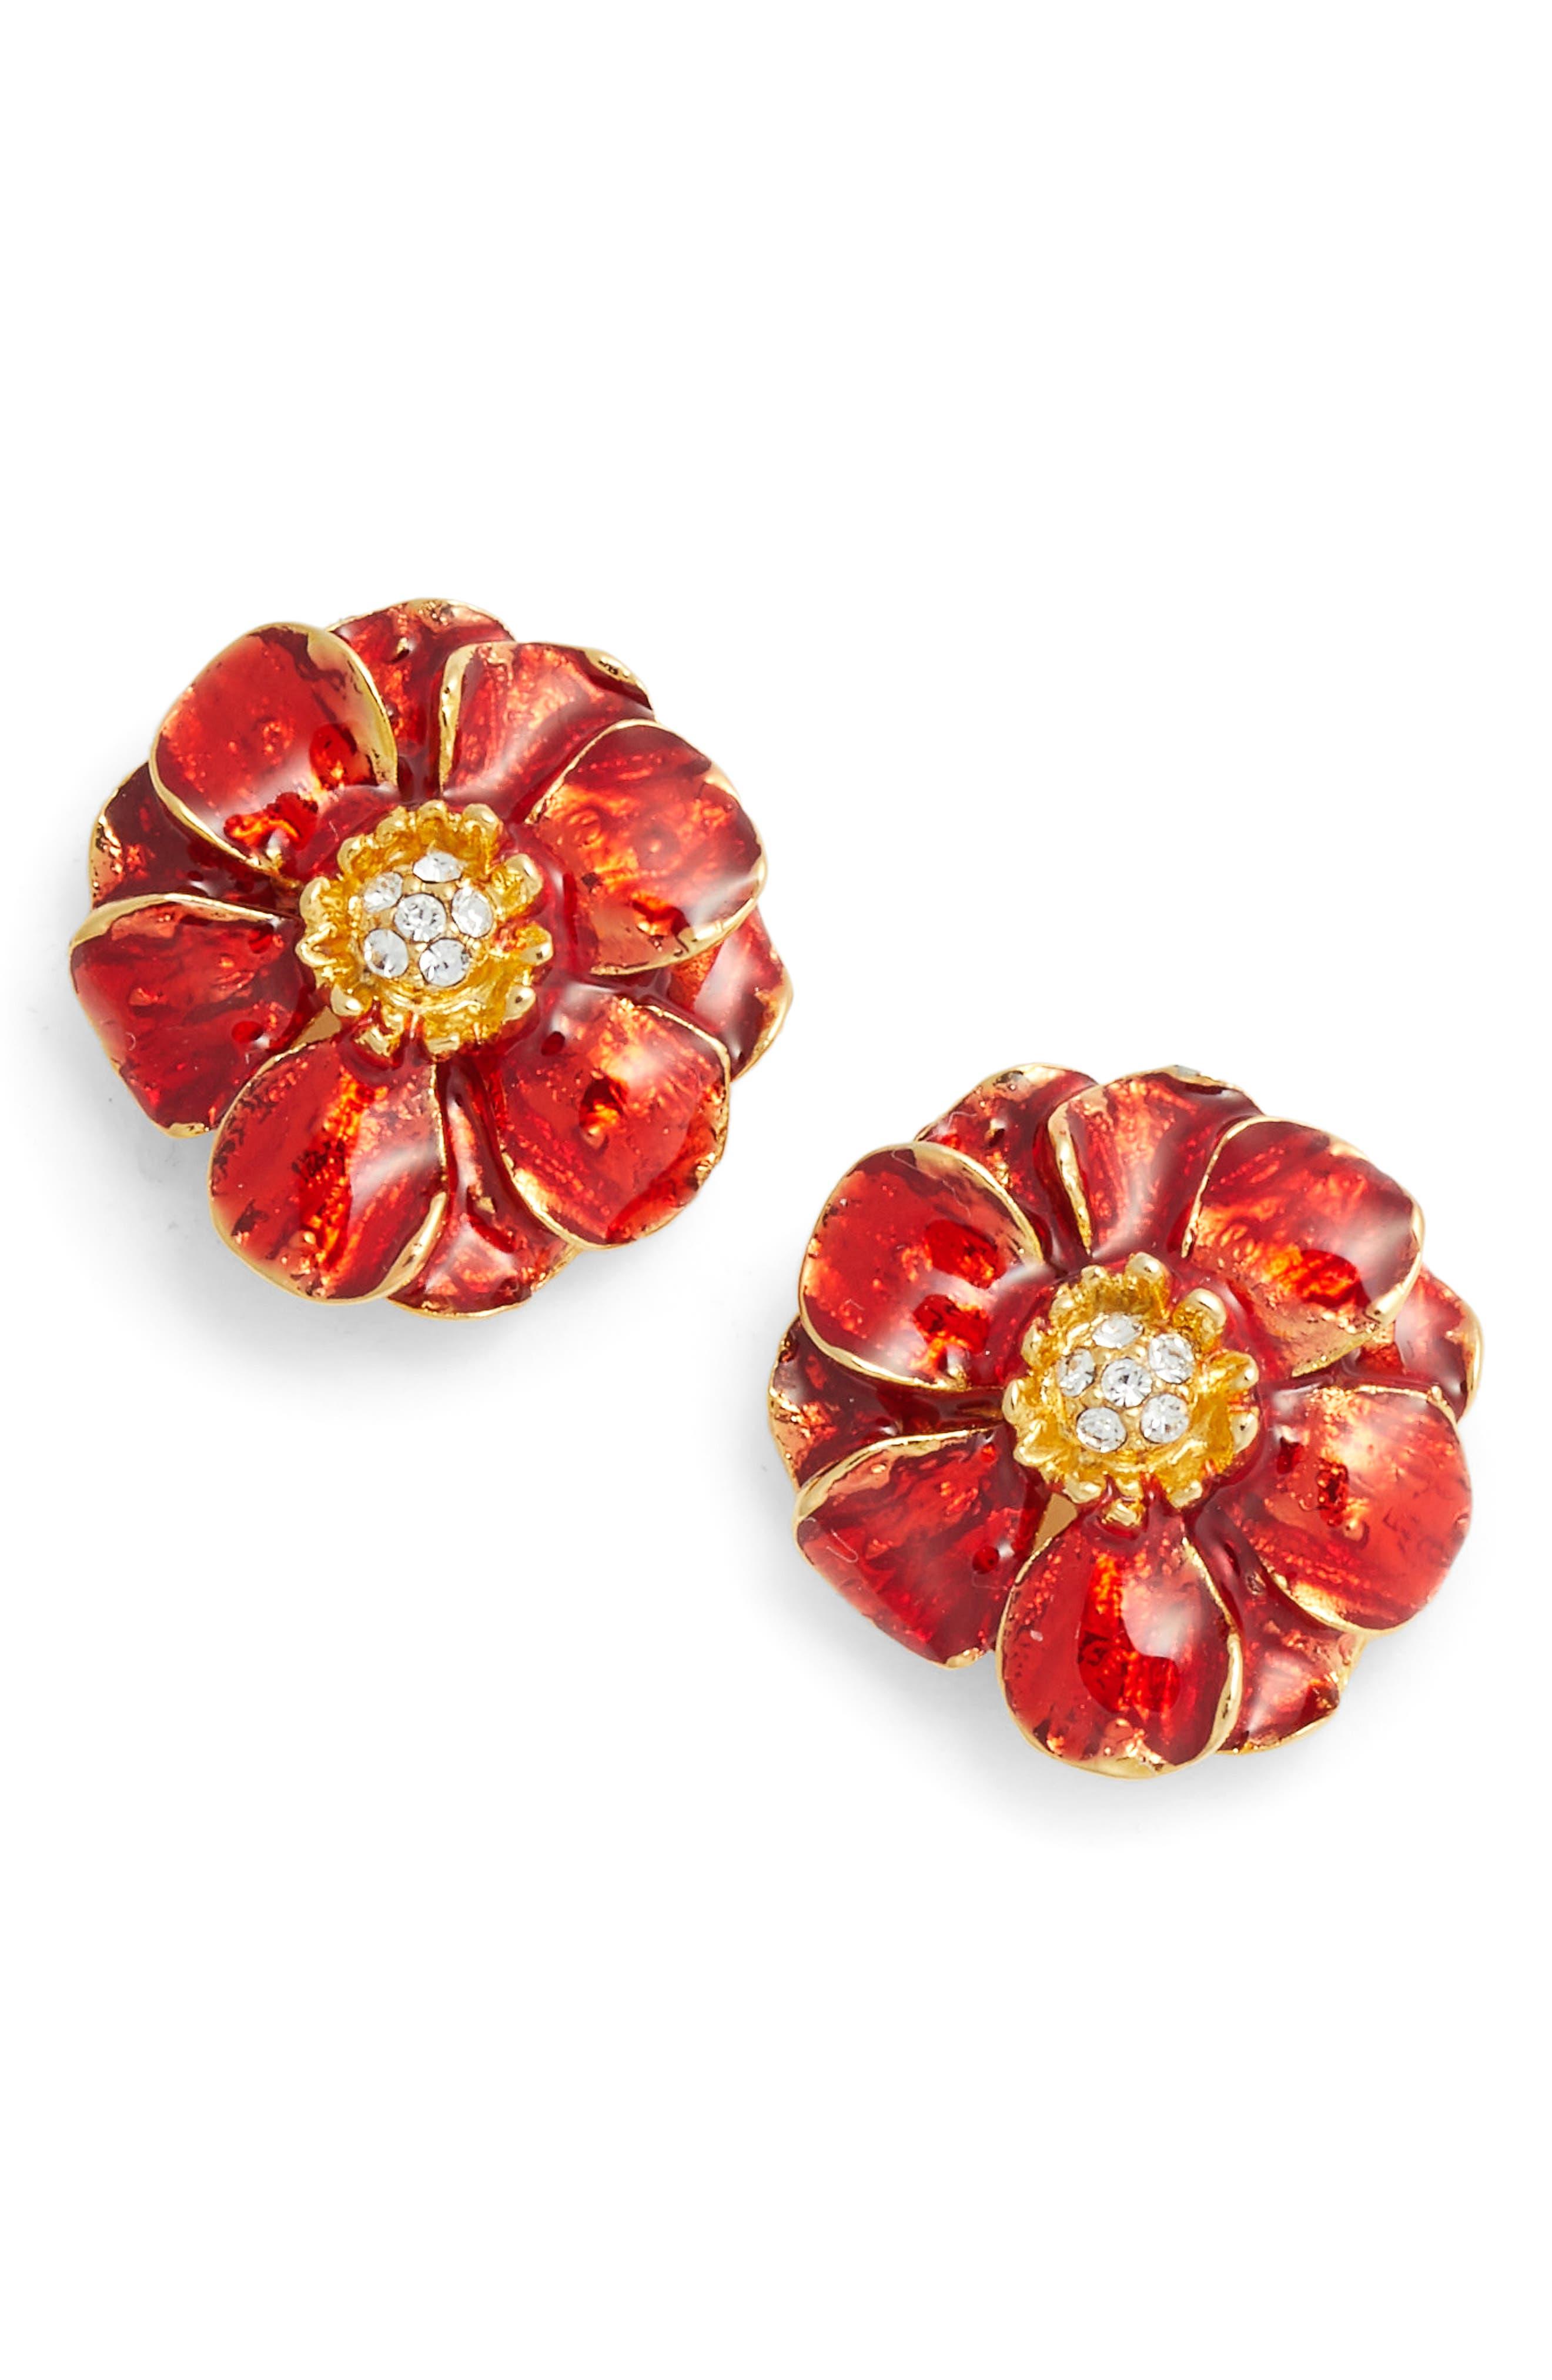 Goldtone Les Roses Earrings,                             Main thumbnail 1, color,                             Multi